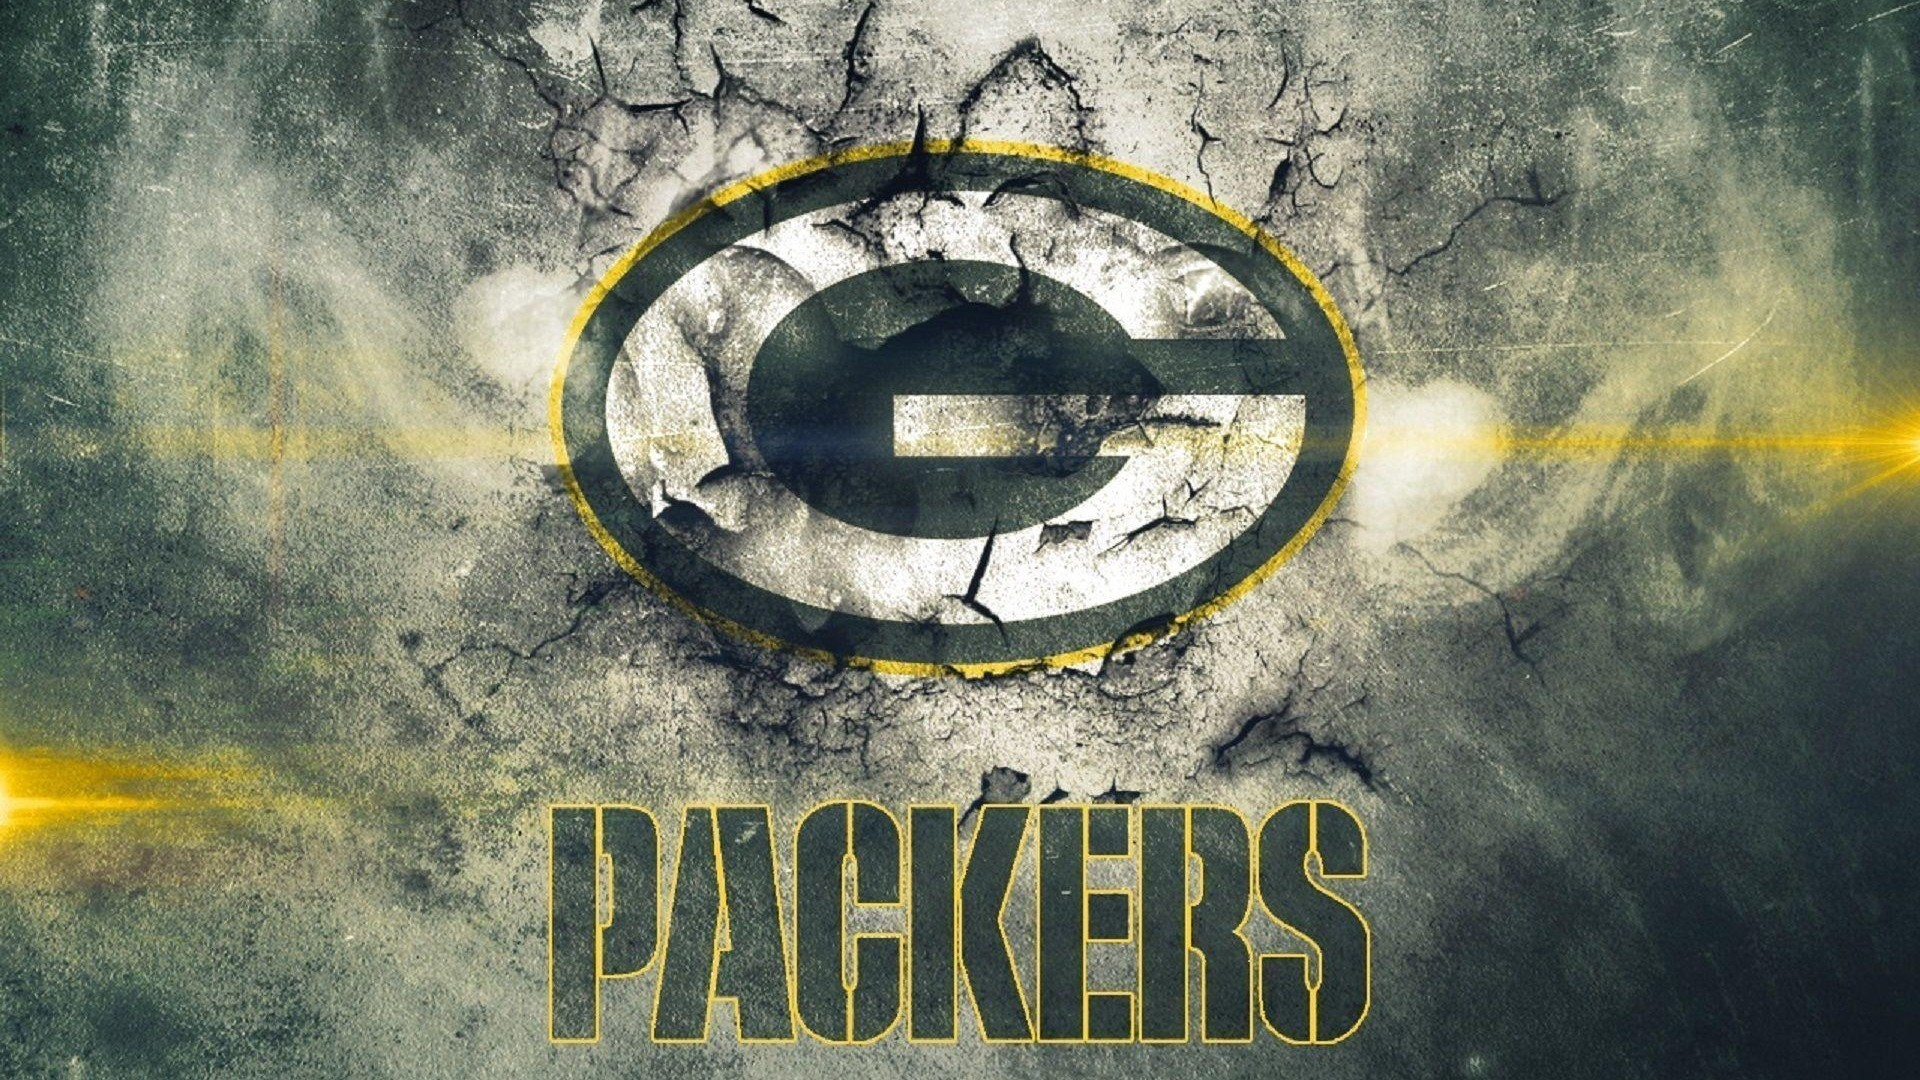 Green Bay Packers Wallpaper theme